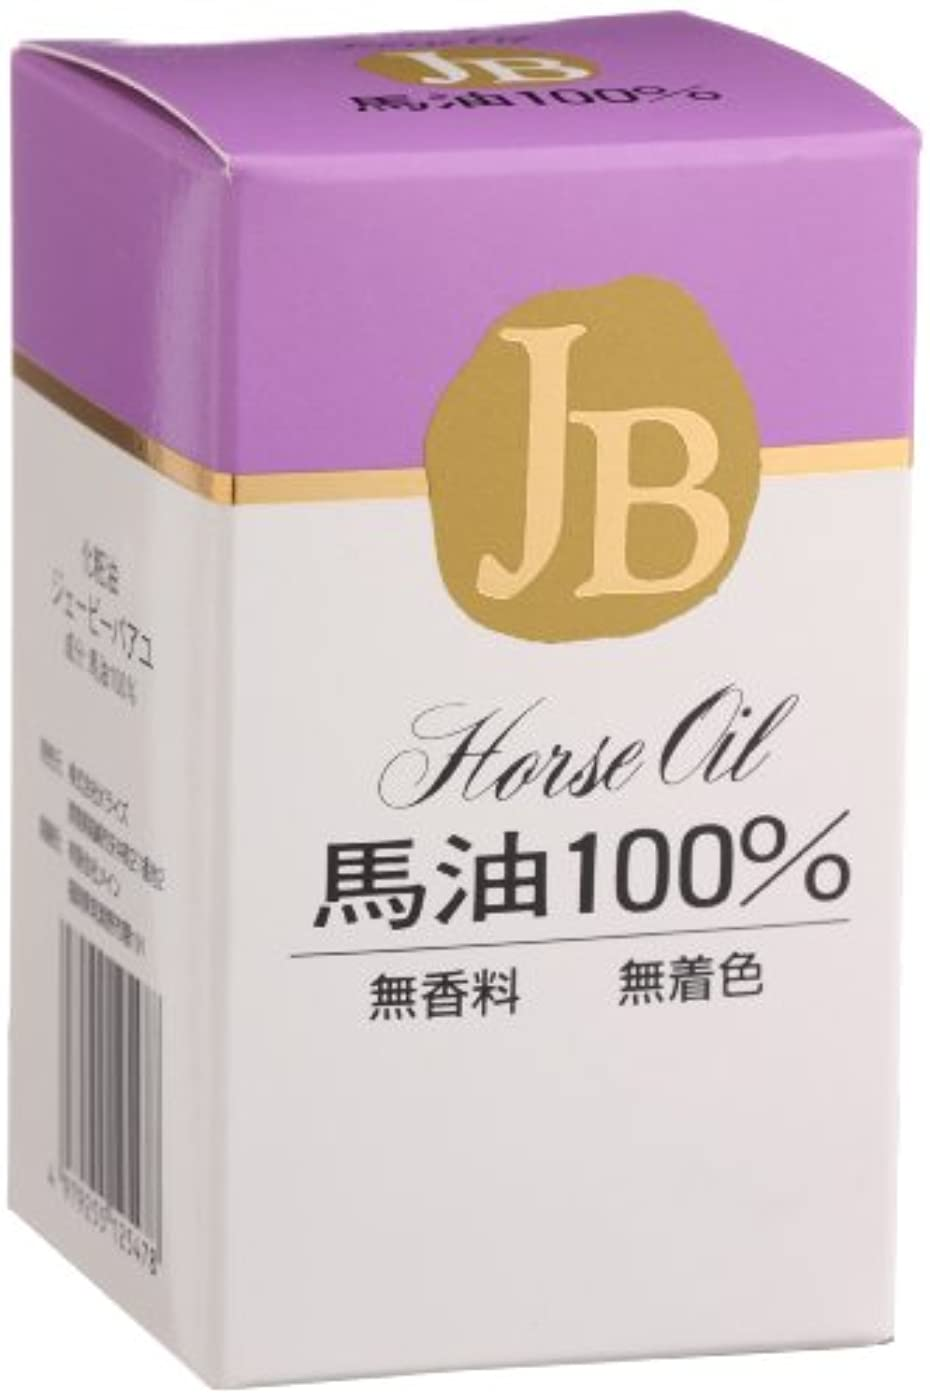 JB馬油 100% 70ml